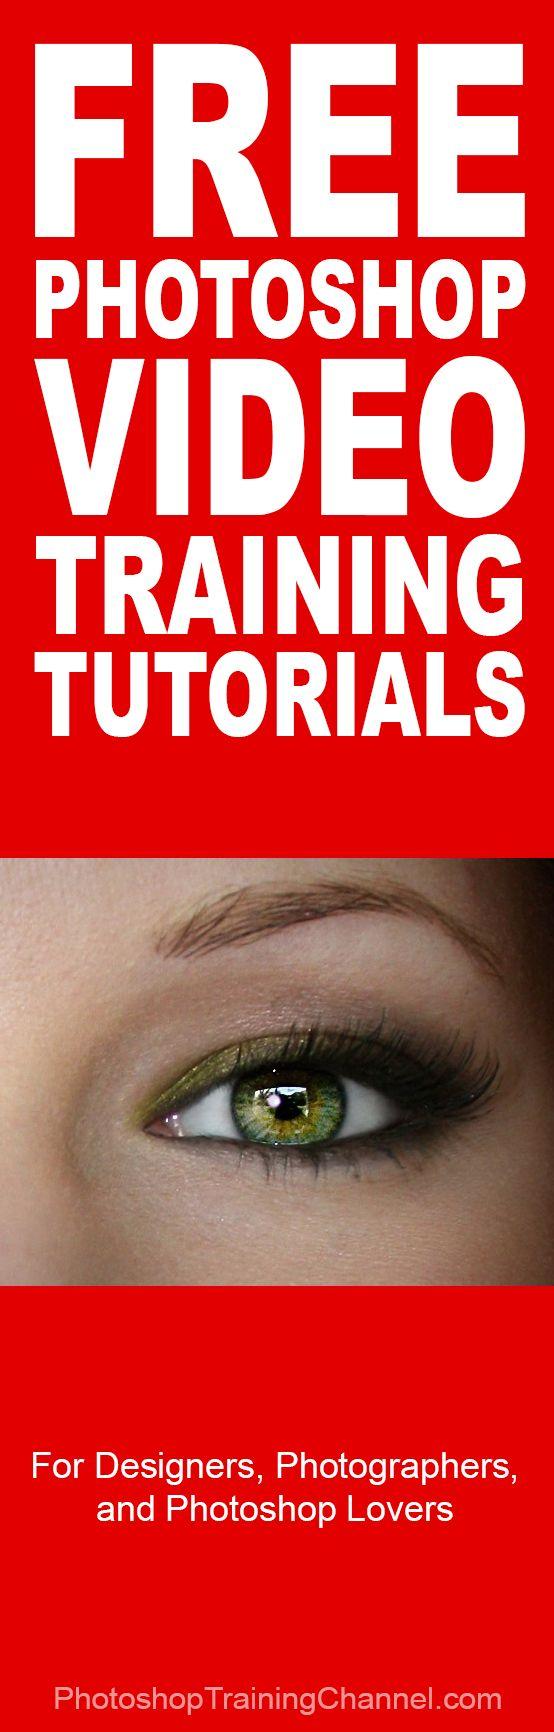 The best Free Photoshop video training http://photoshoptrainingchannel.com